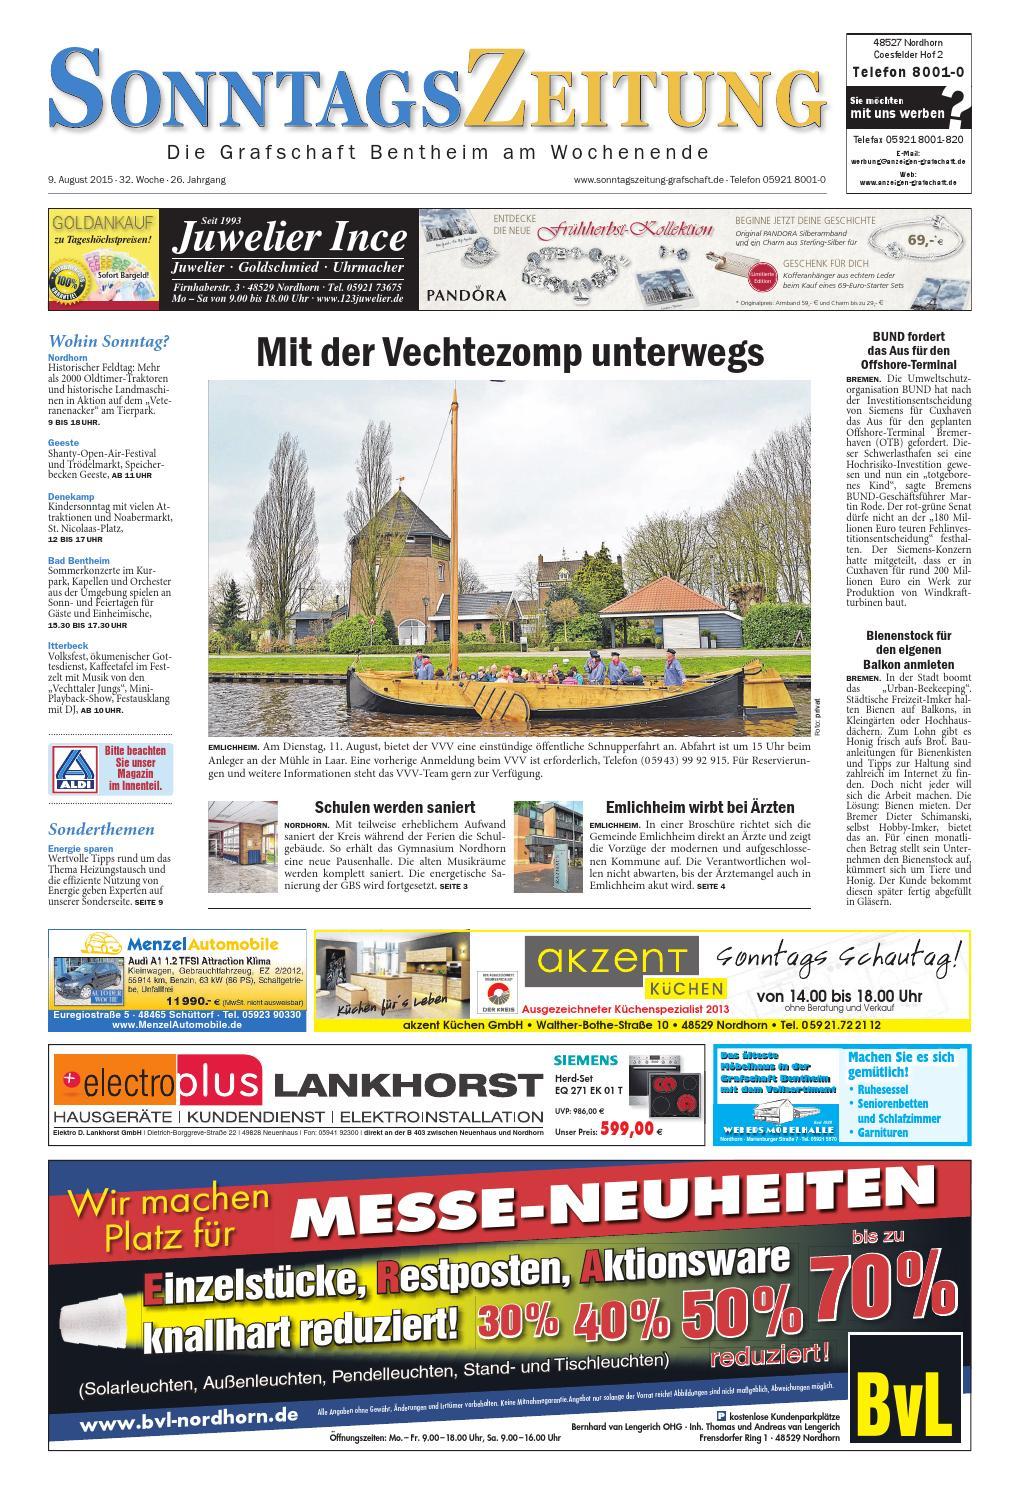 Sonntagszeitung_9.8.2015 by SonntagsZeitung - issuu